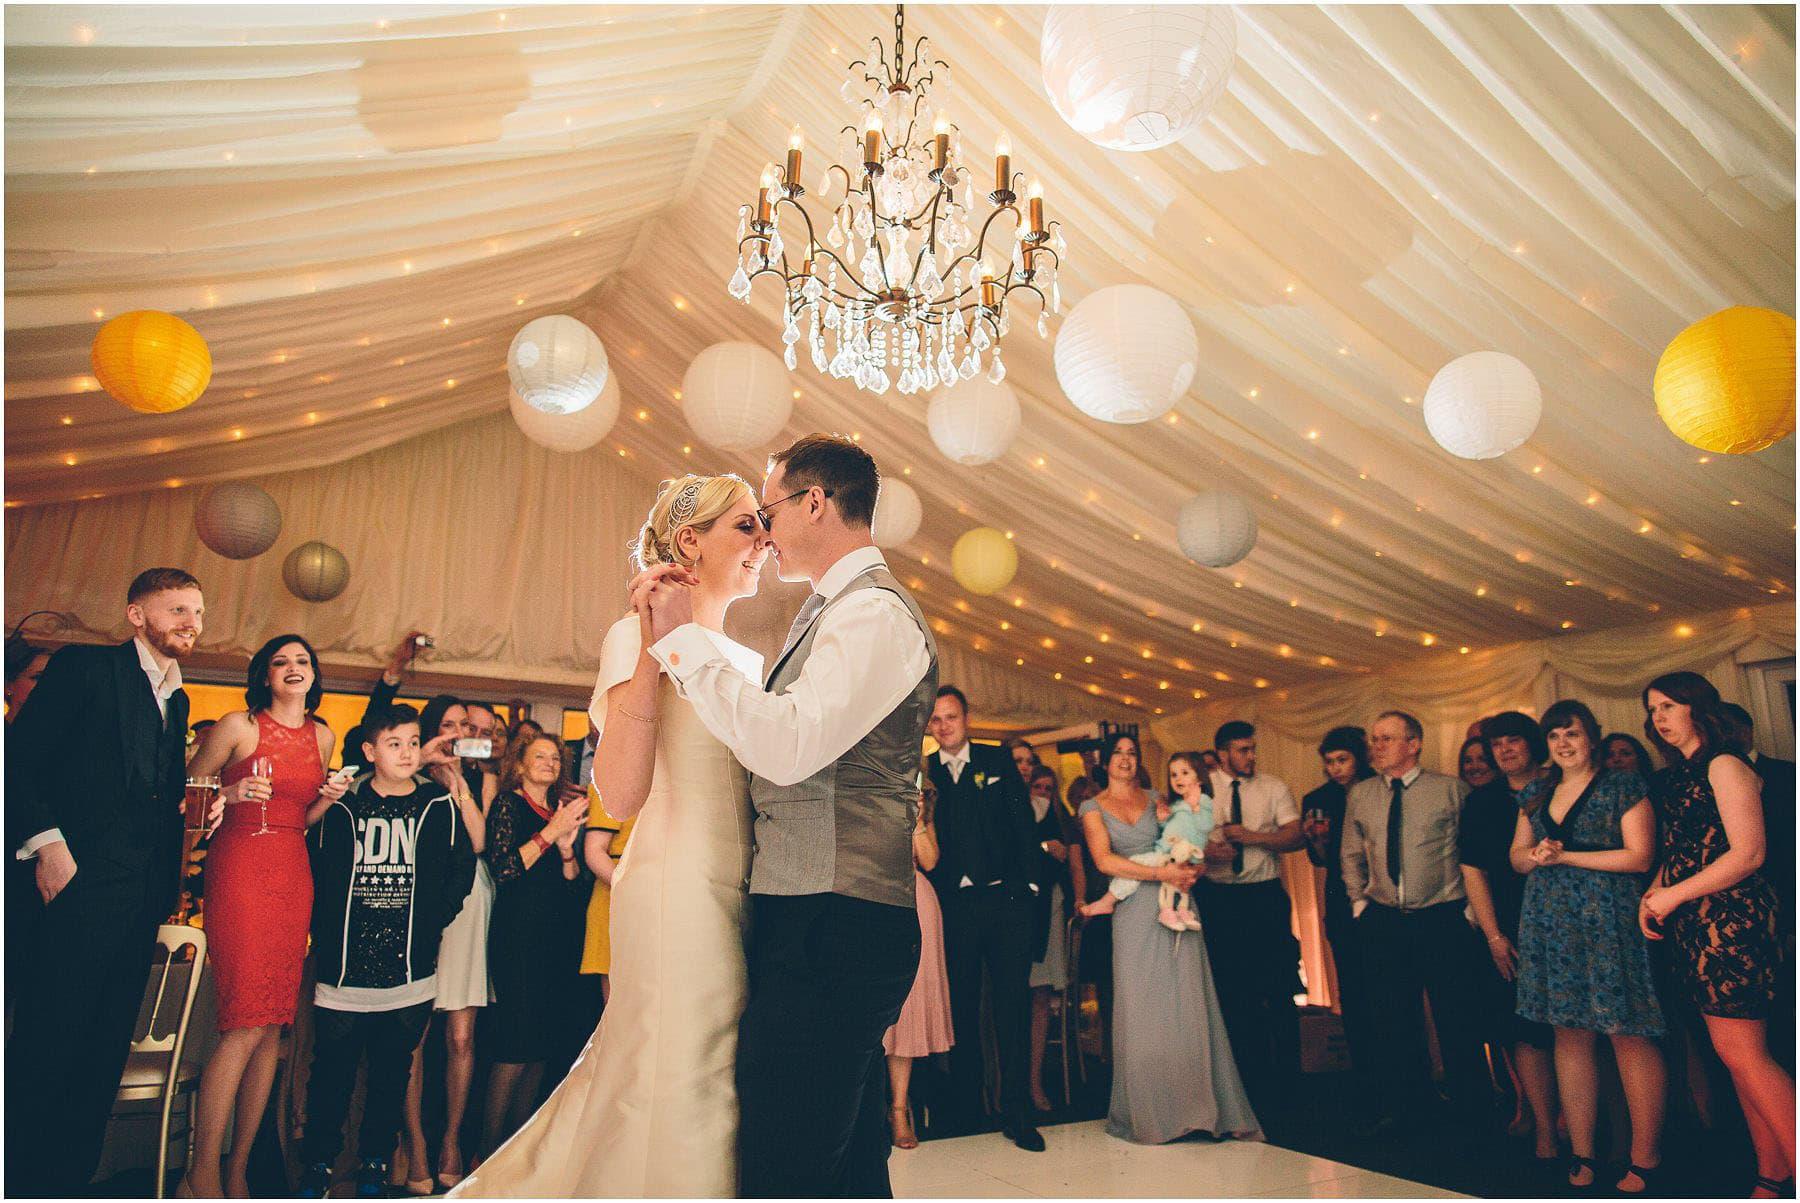 Capesthorne_Hall_Wedding_Photography_0139